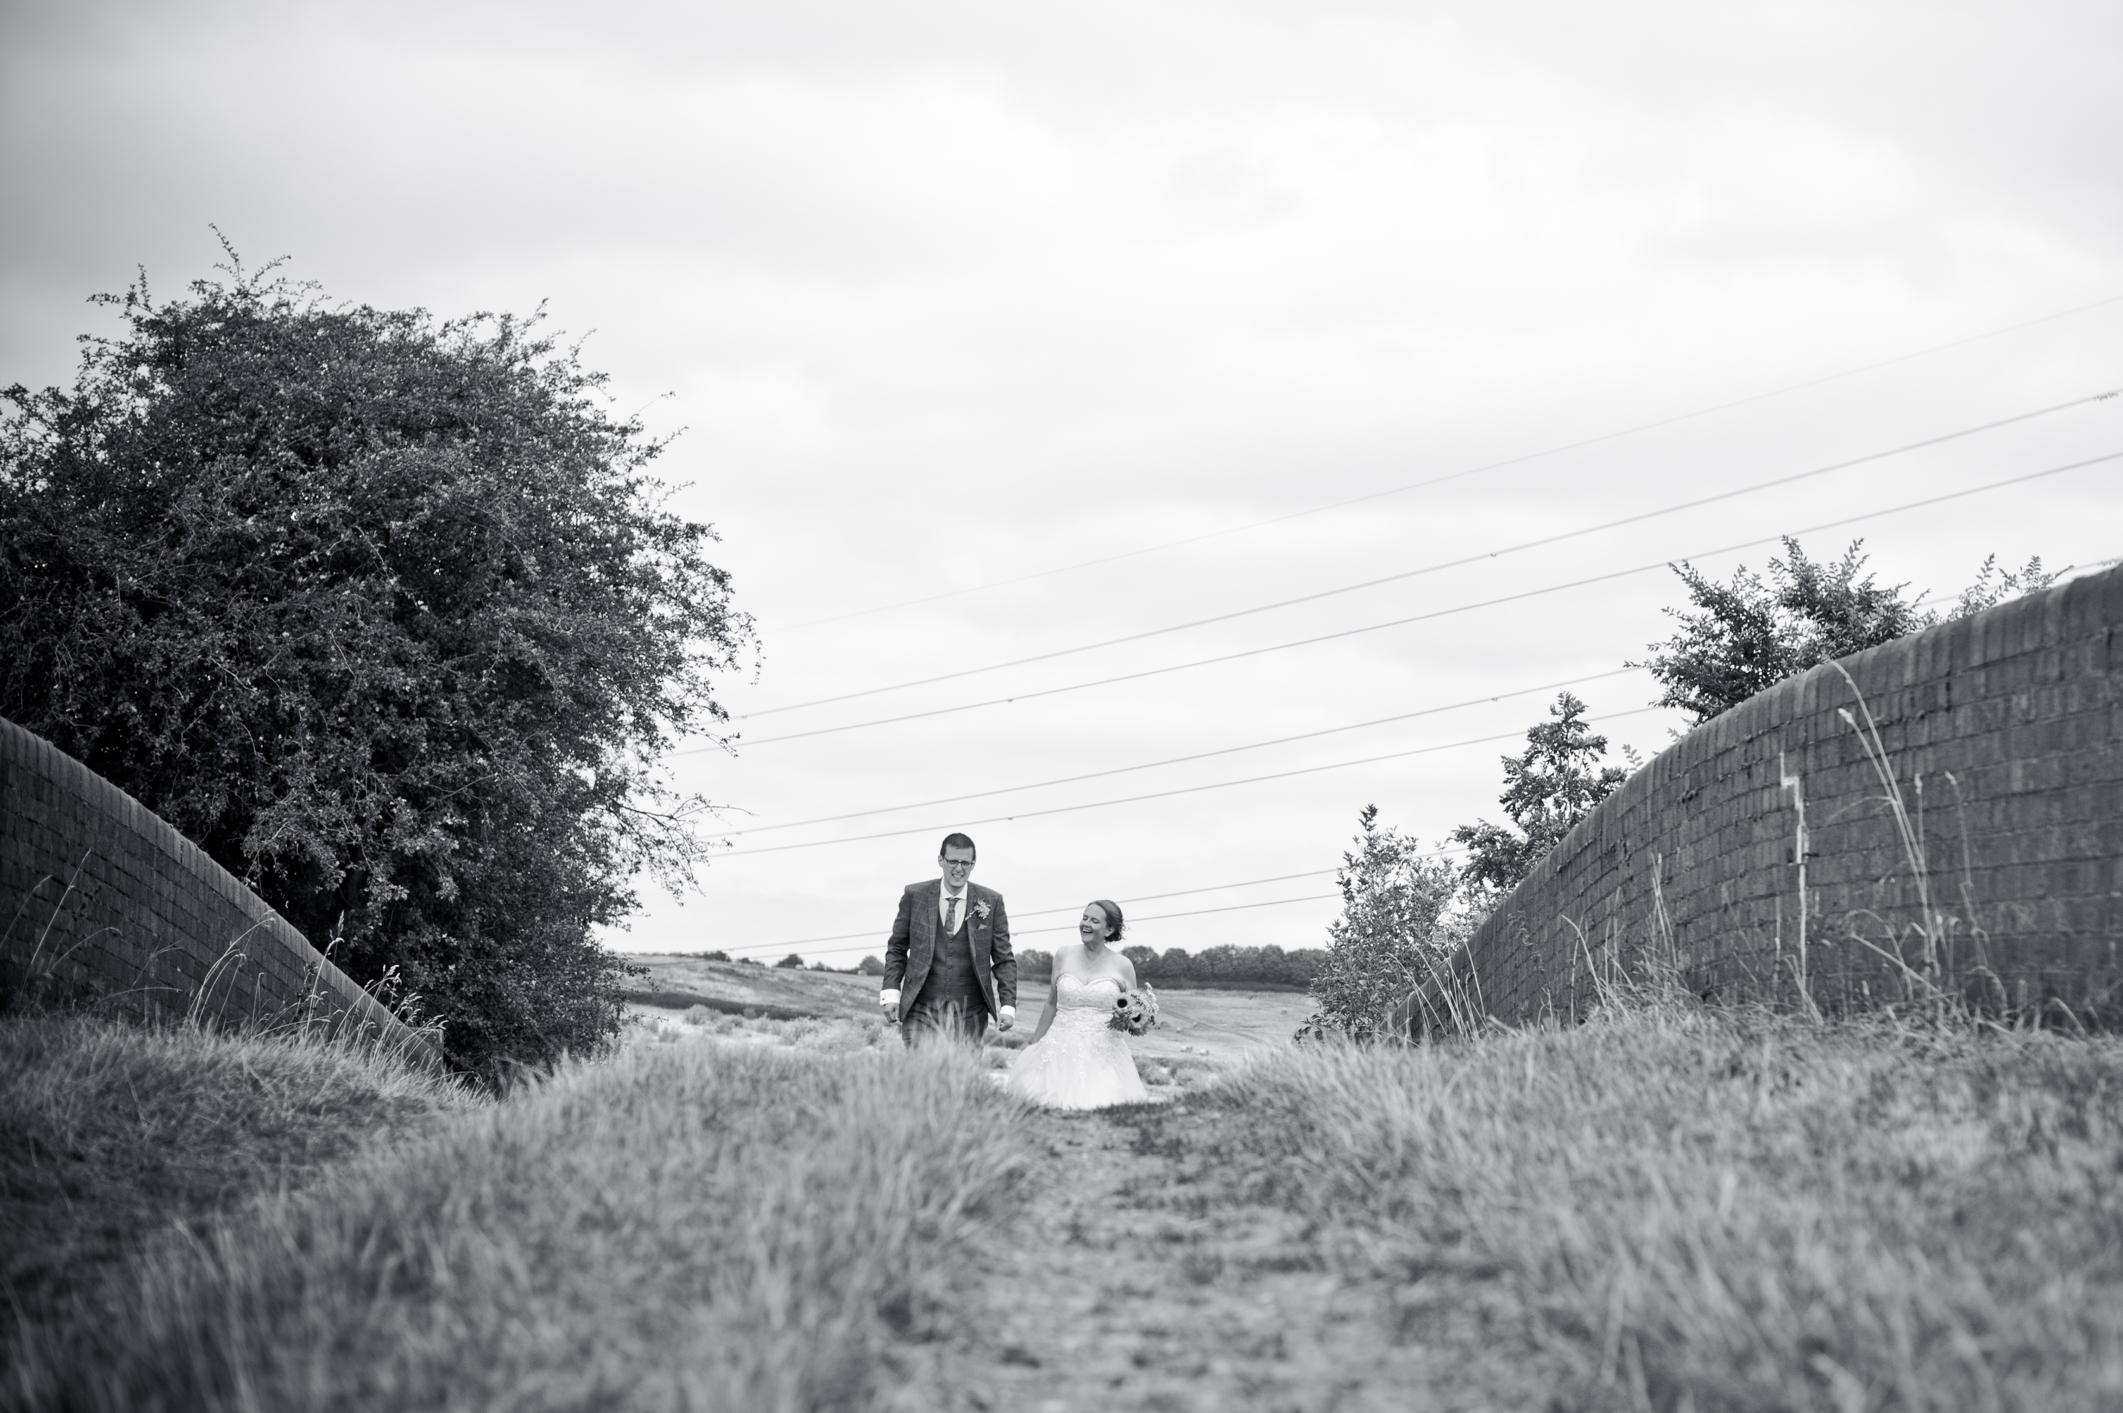 Market Harborough Wedding Photographer  (22 of 40).jpg